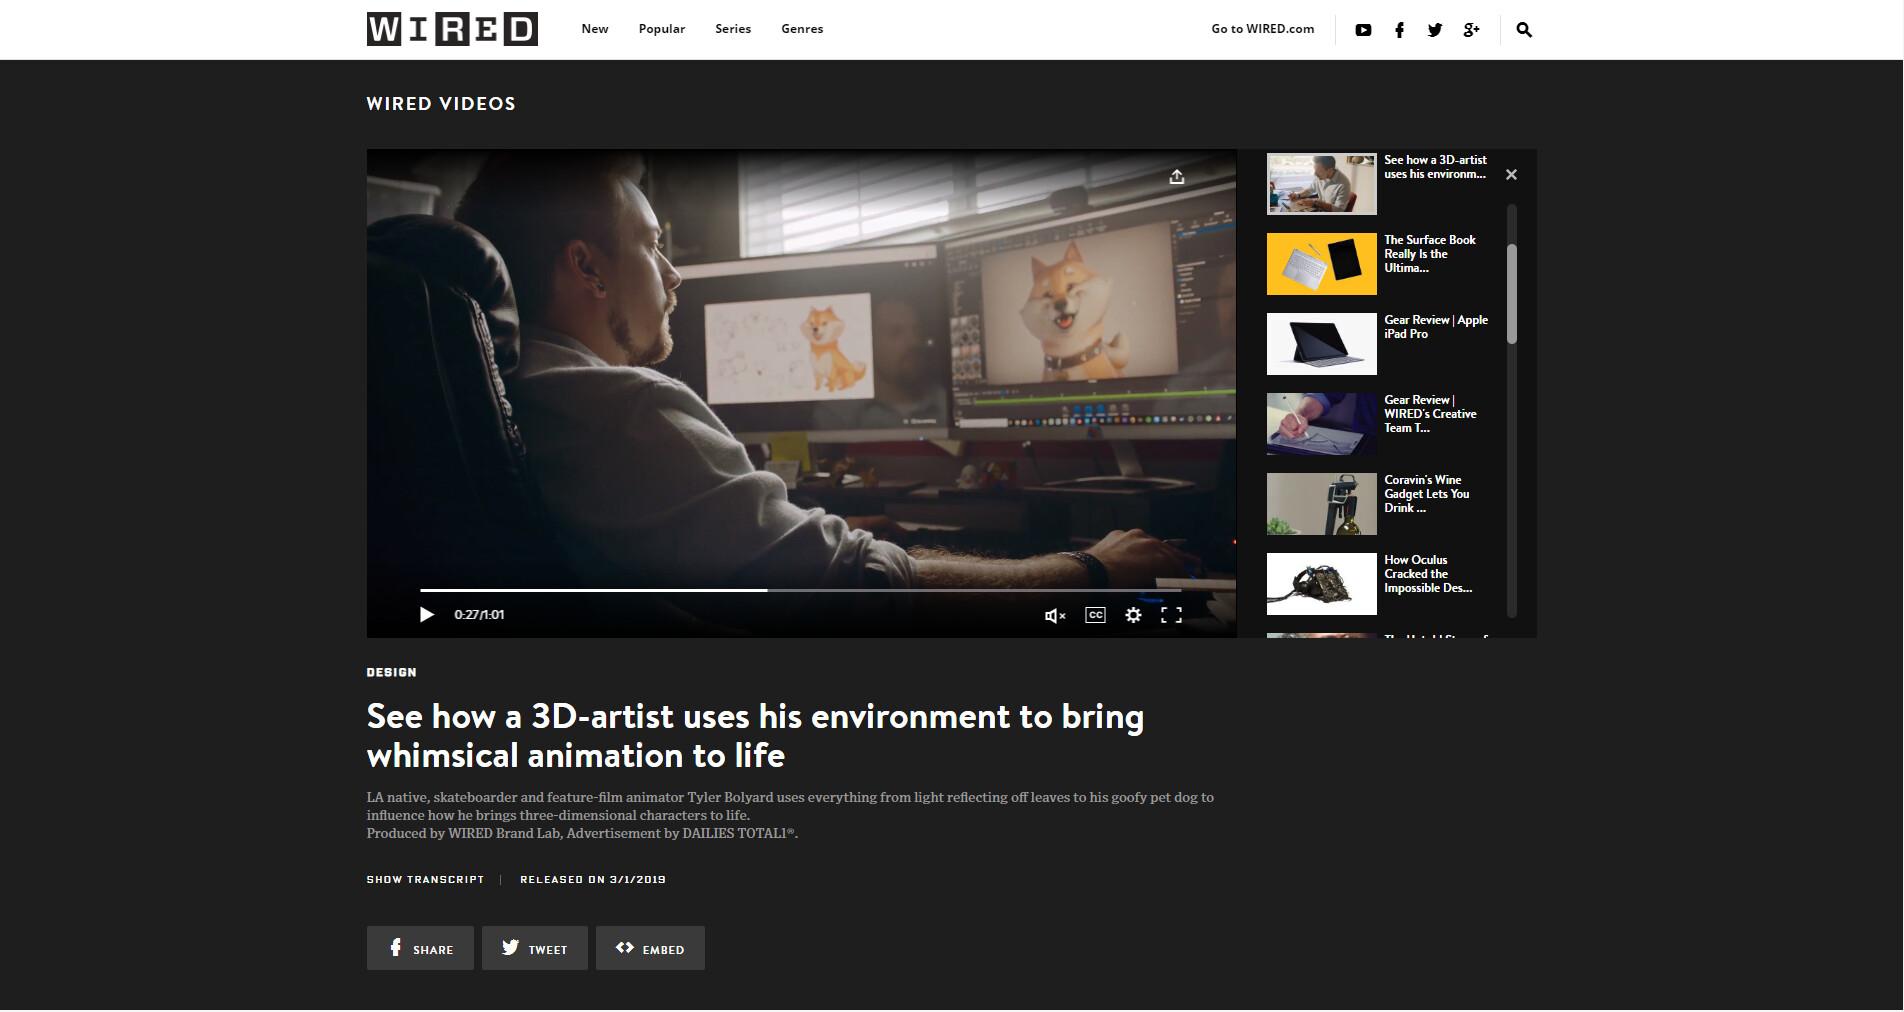 Tyler bolyard commercial screenshot 02